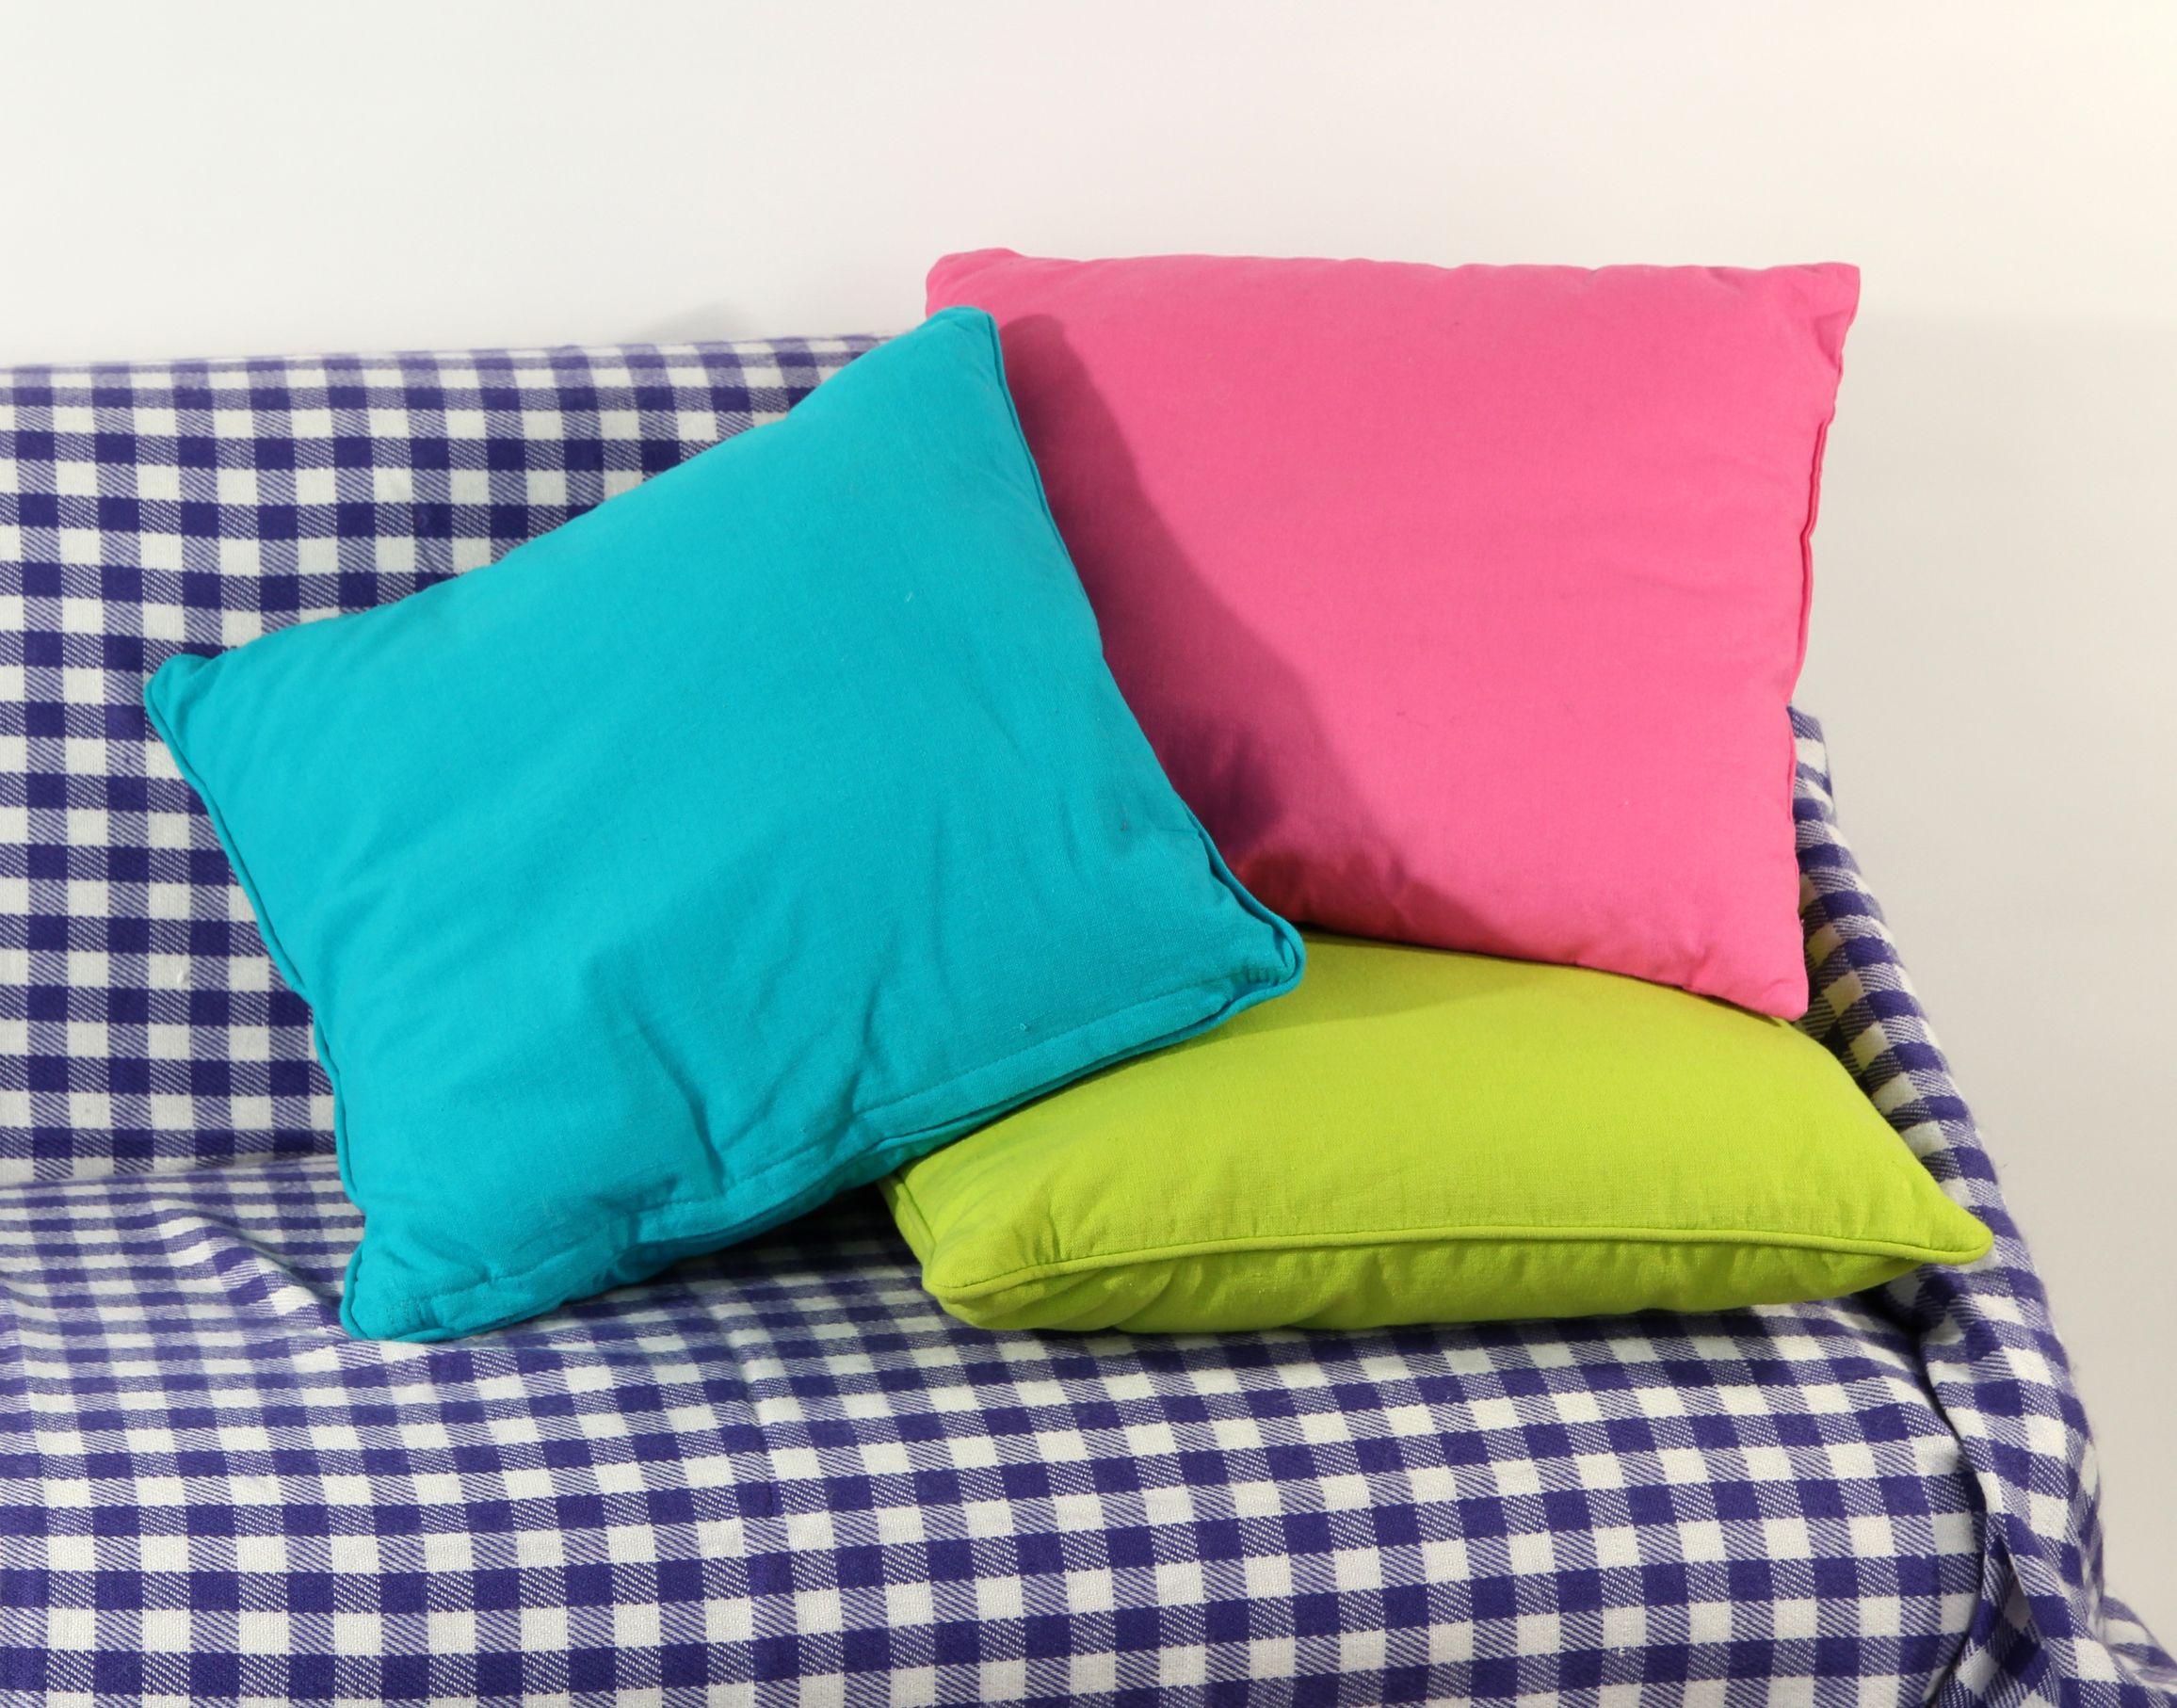 Cojines de colores pastel